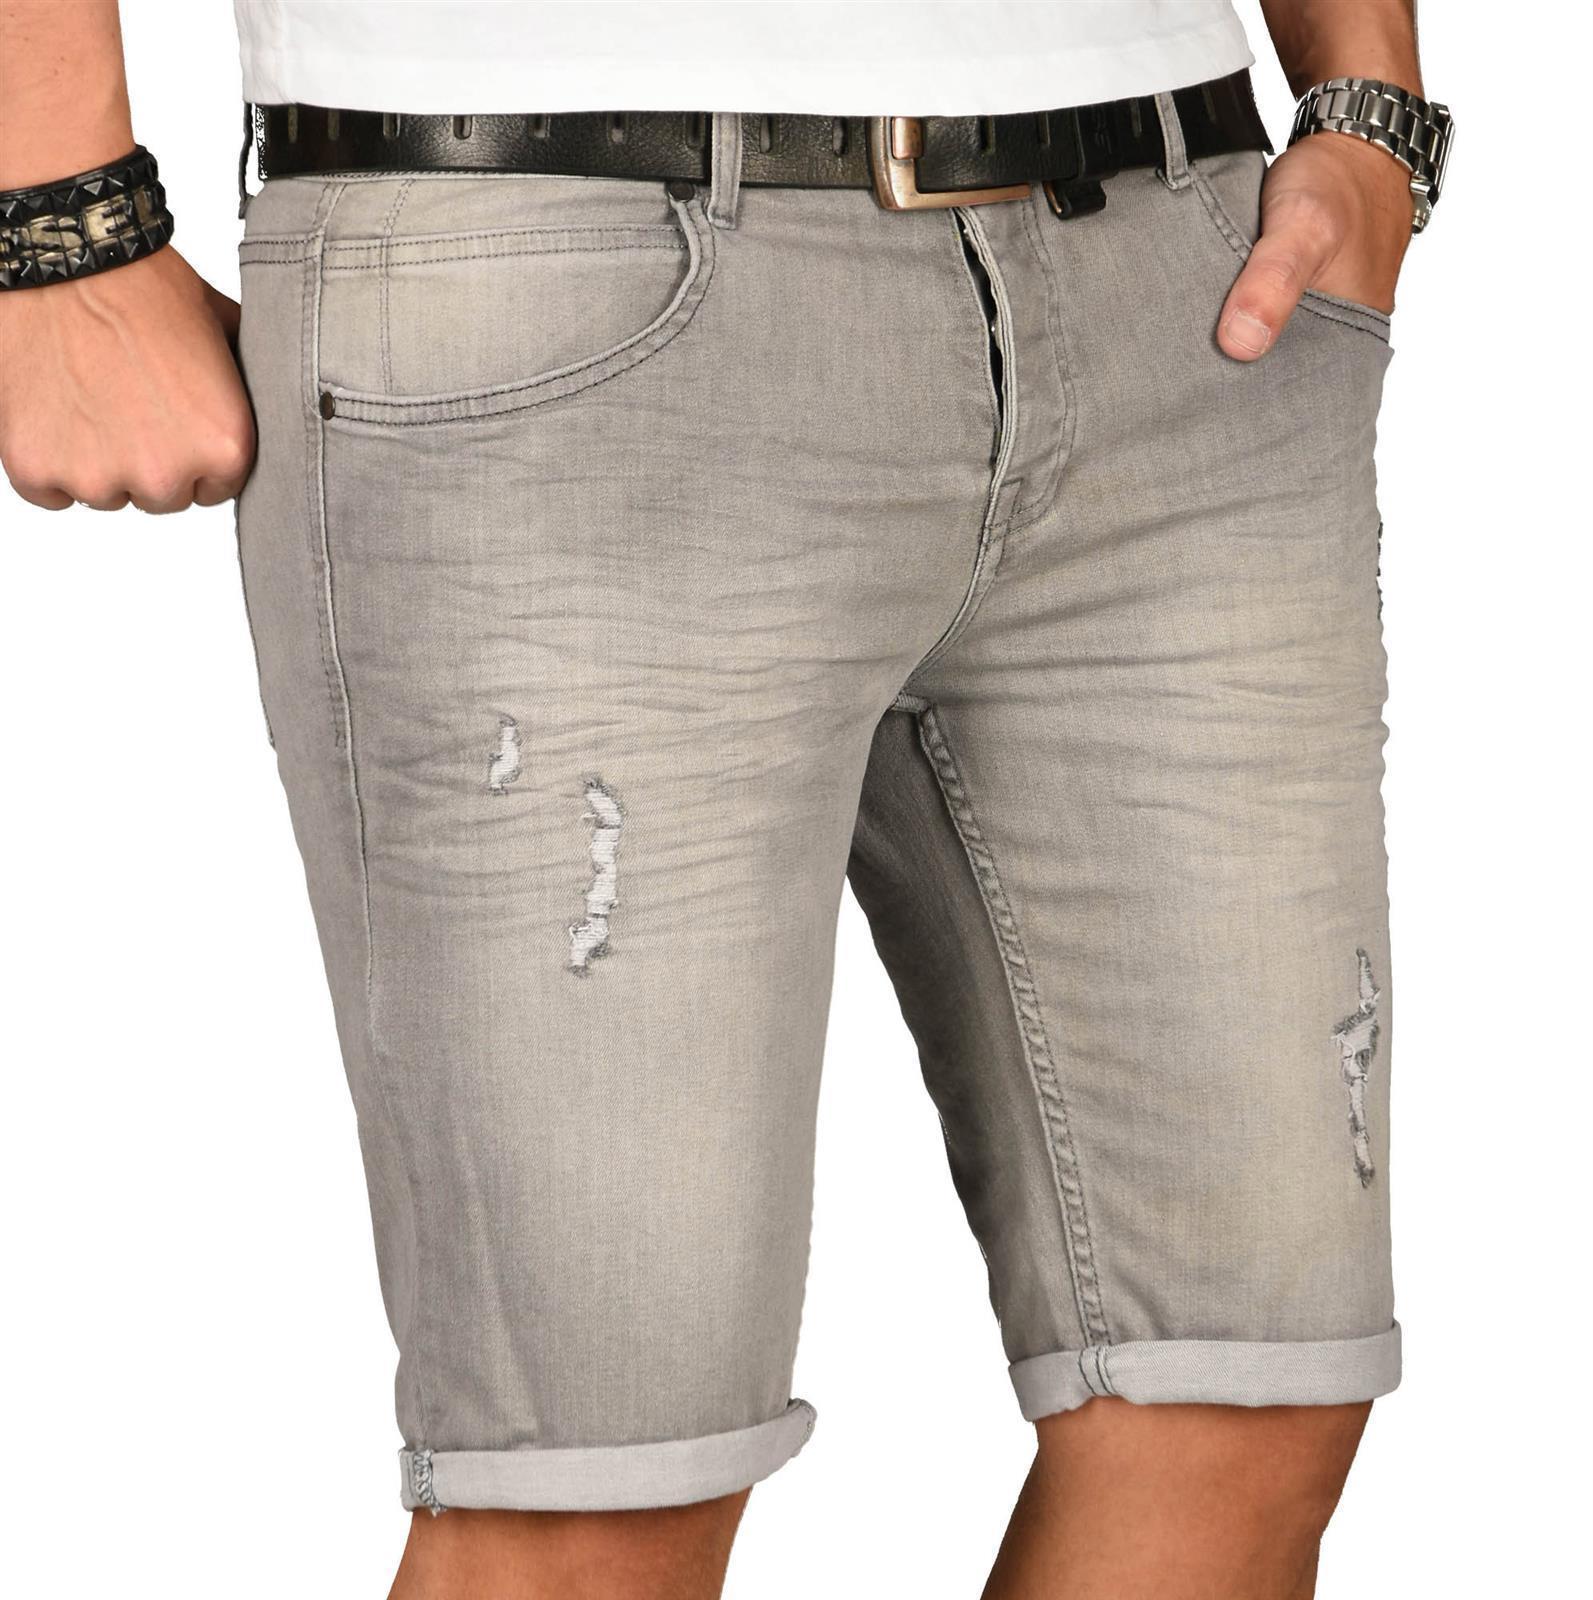 A-Salvarini-Herren-Designer-Jeans-Short-kurze-Hose-Slim-Sommer-Shorts-Washed Indexbild 39